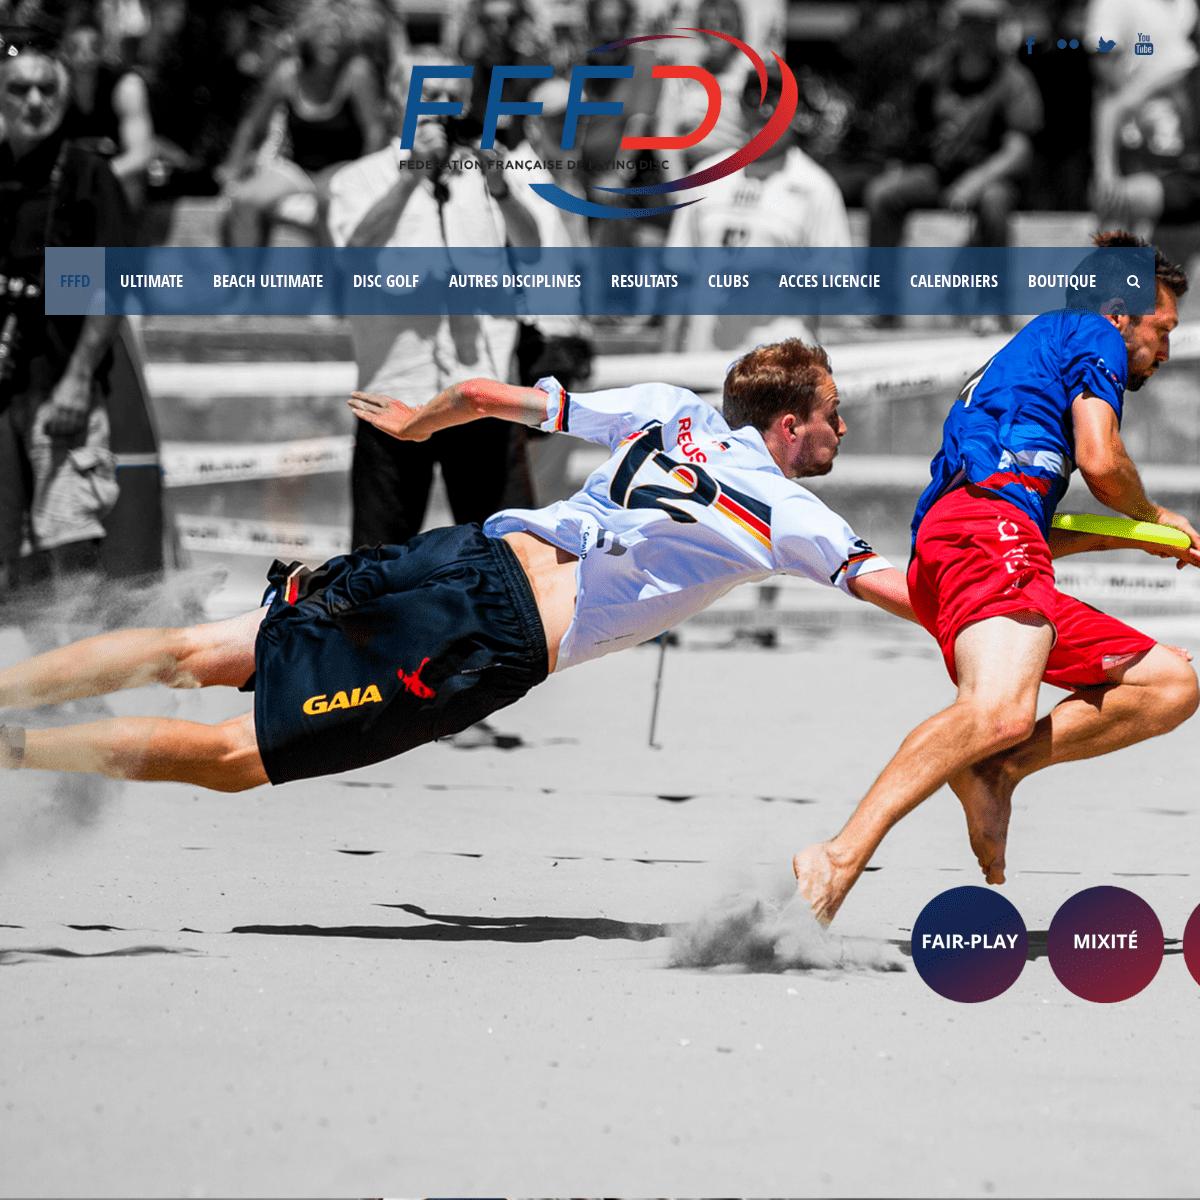 ArchiveBay.com - ffdf.fr - FFFD – Fédération Française de Flying Disc FEDERATION FLYING DISC FRANCE - Tout sur l'Ultimate Frisbee et le Disc Golf